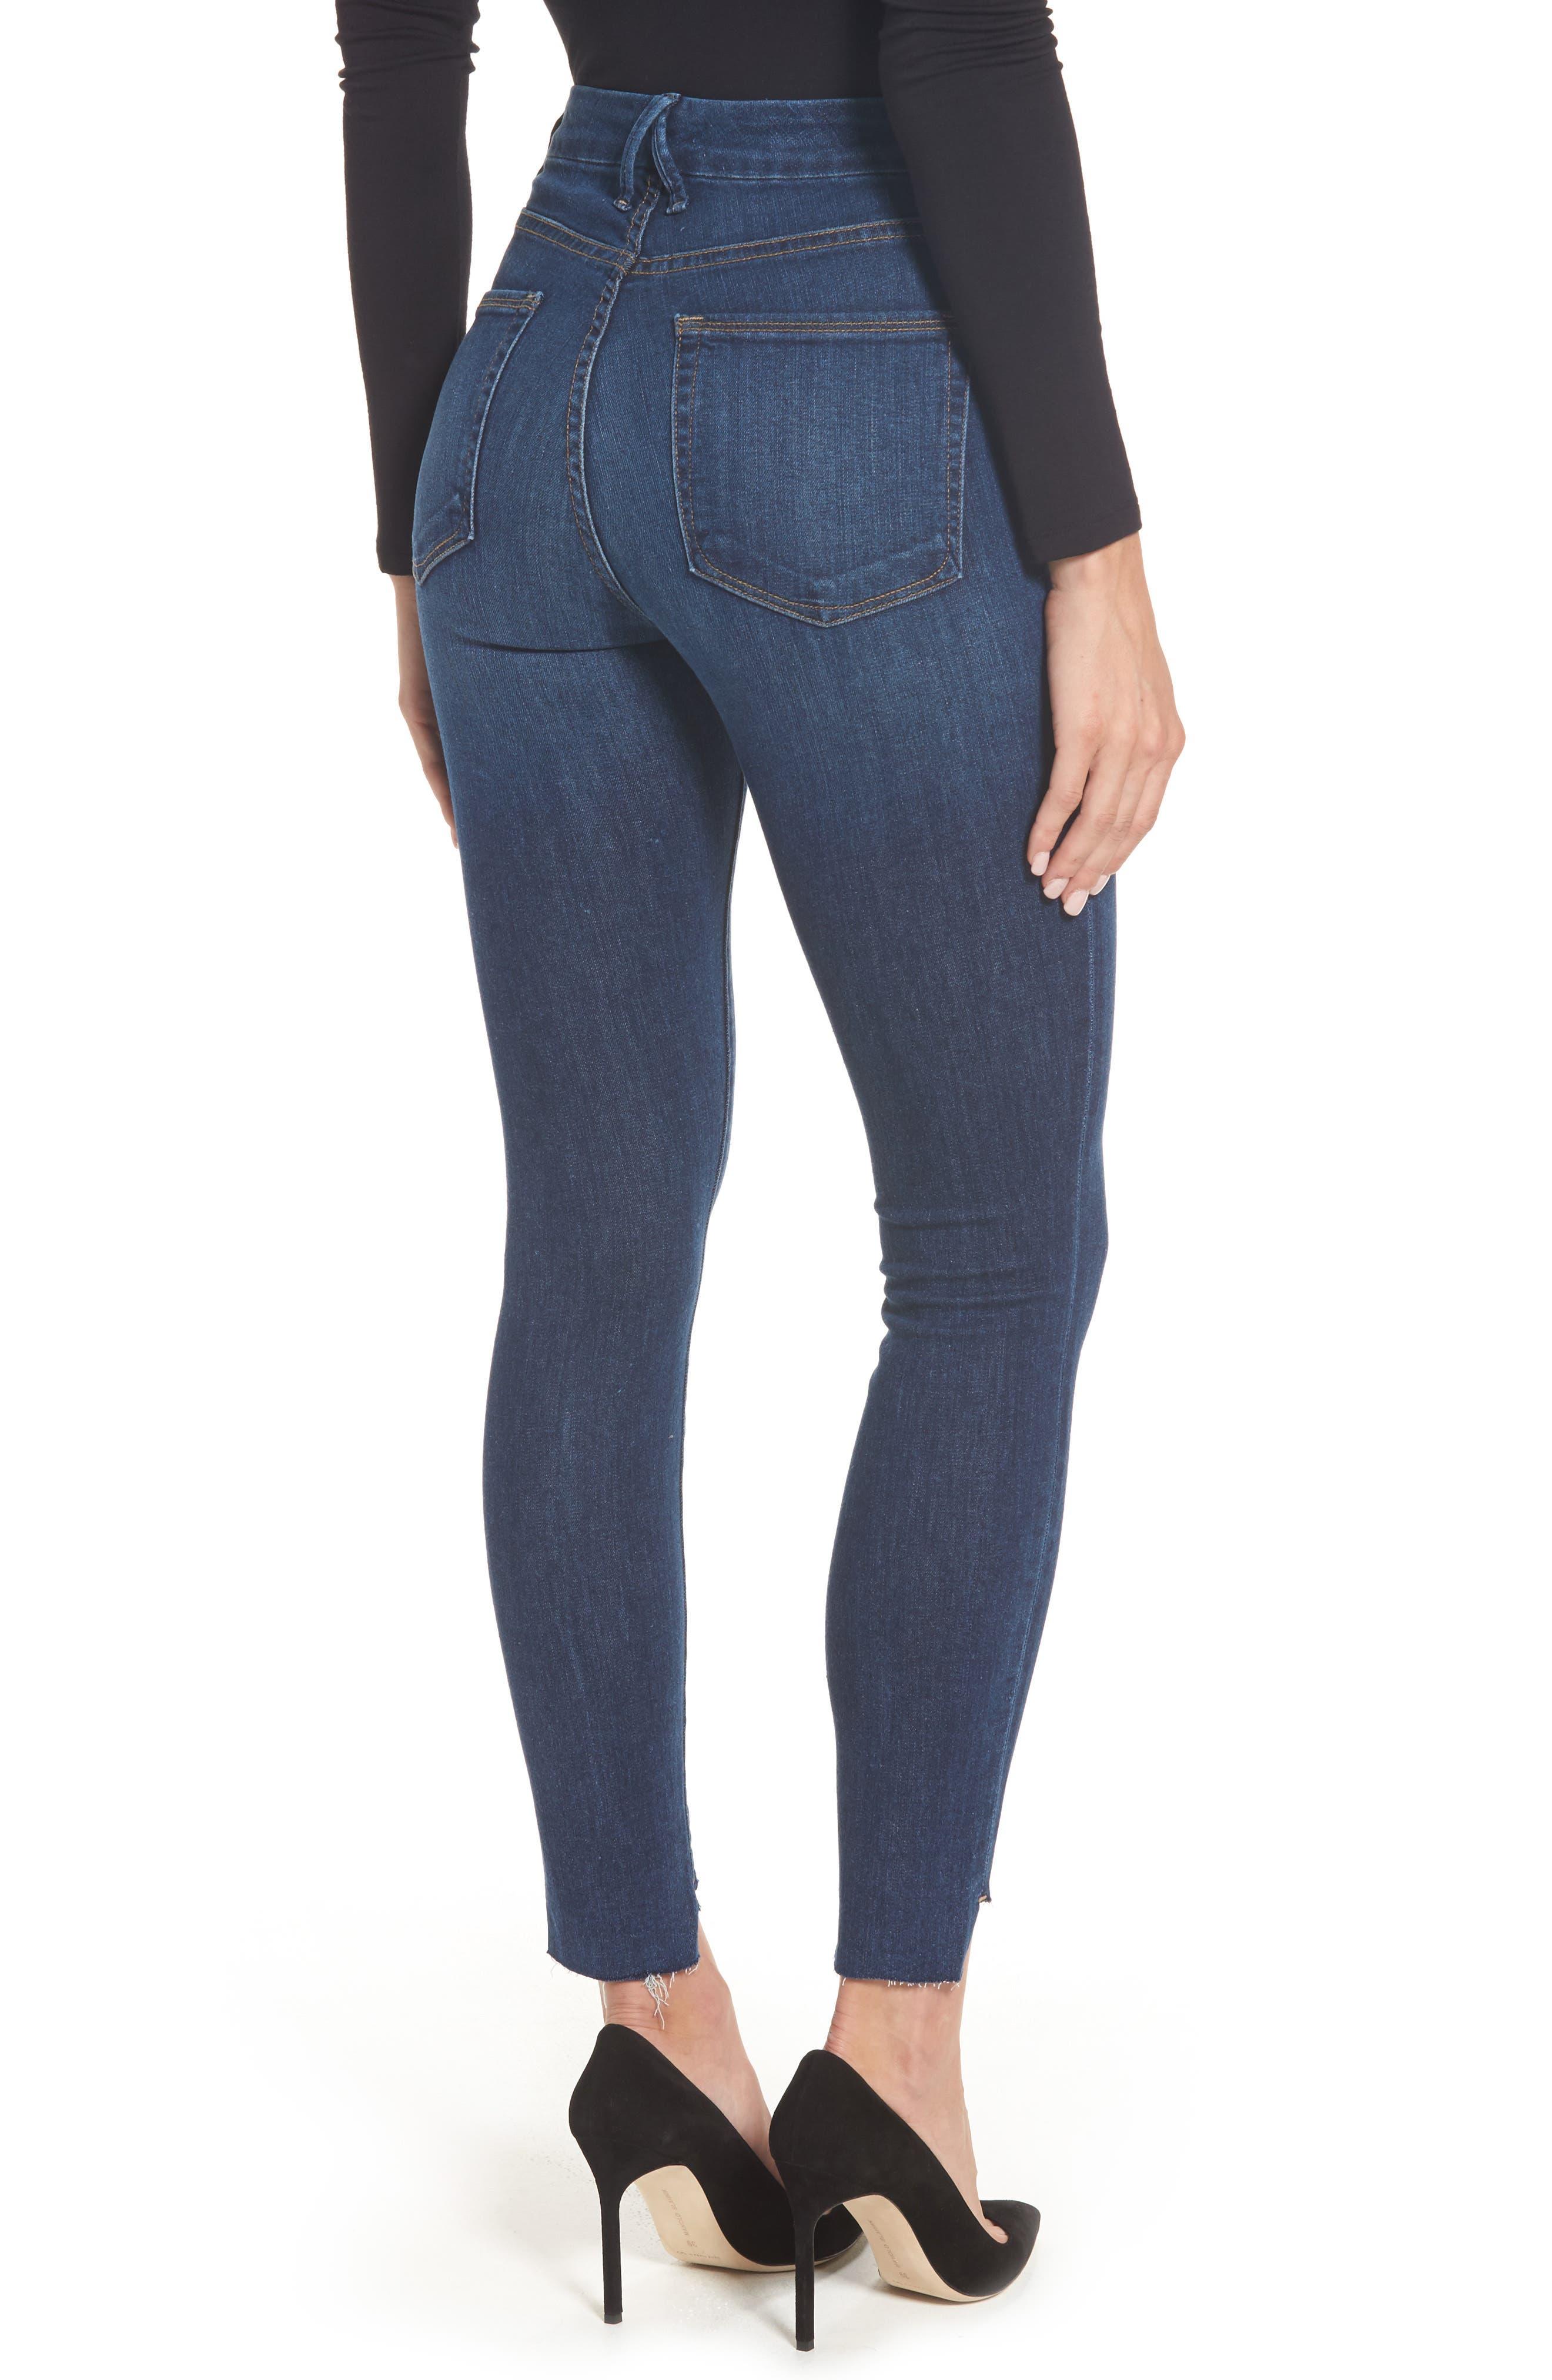 Alternate Image 2  - Good American Good Legs High Waist Skinny Jeans (Blue 046) (Extended Sizes)